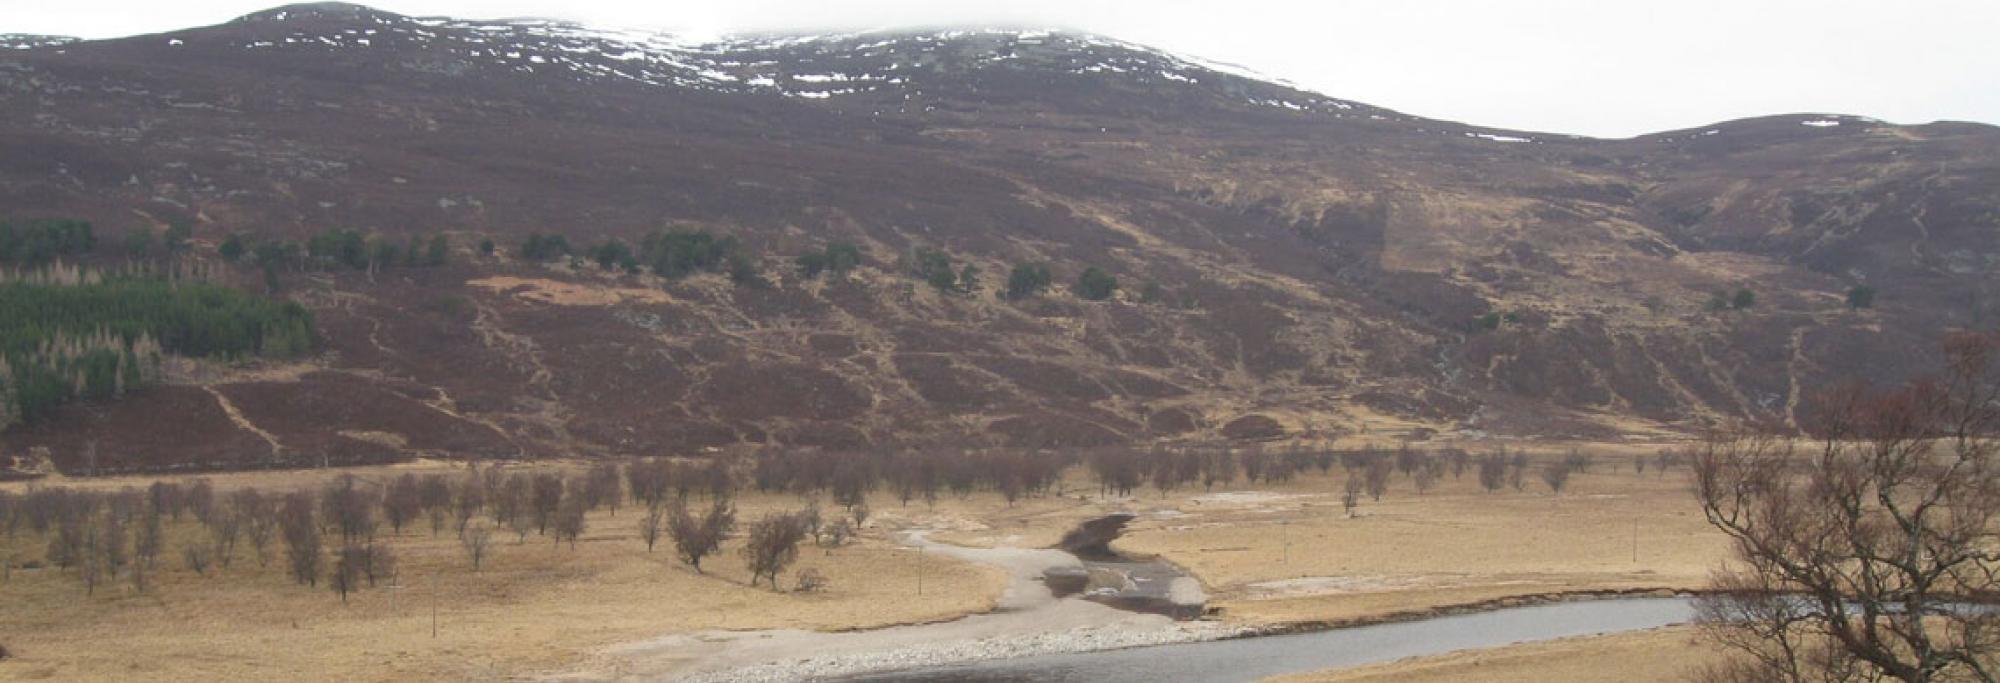 river-and-floodplain